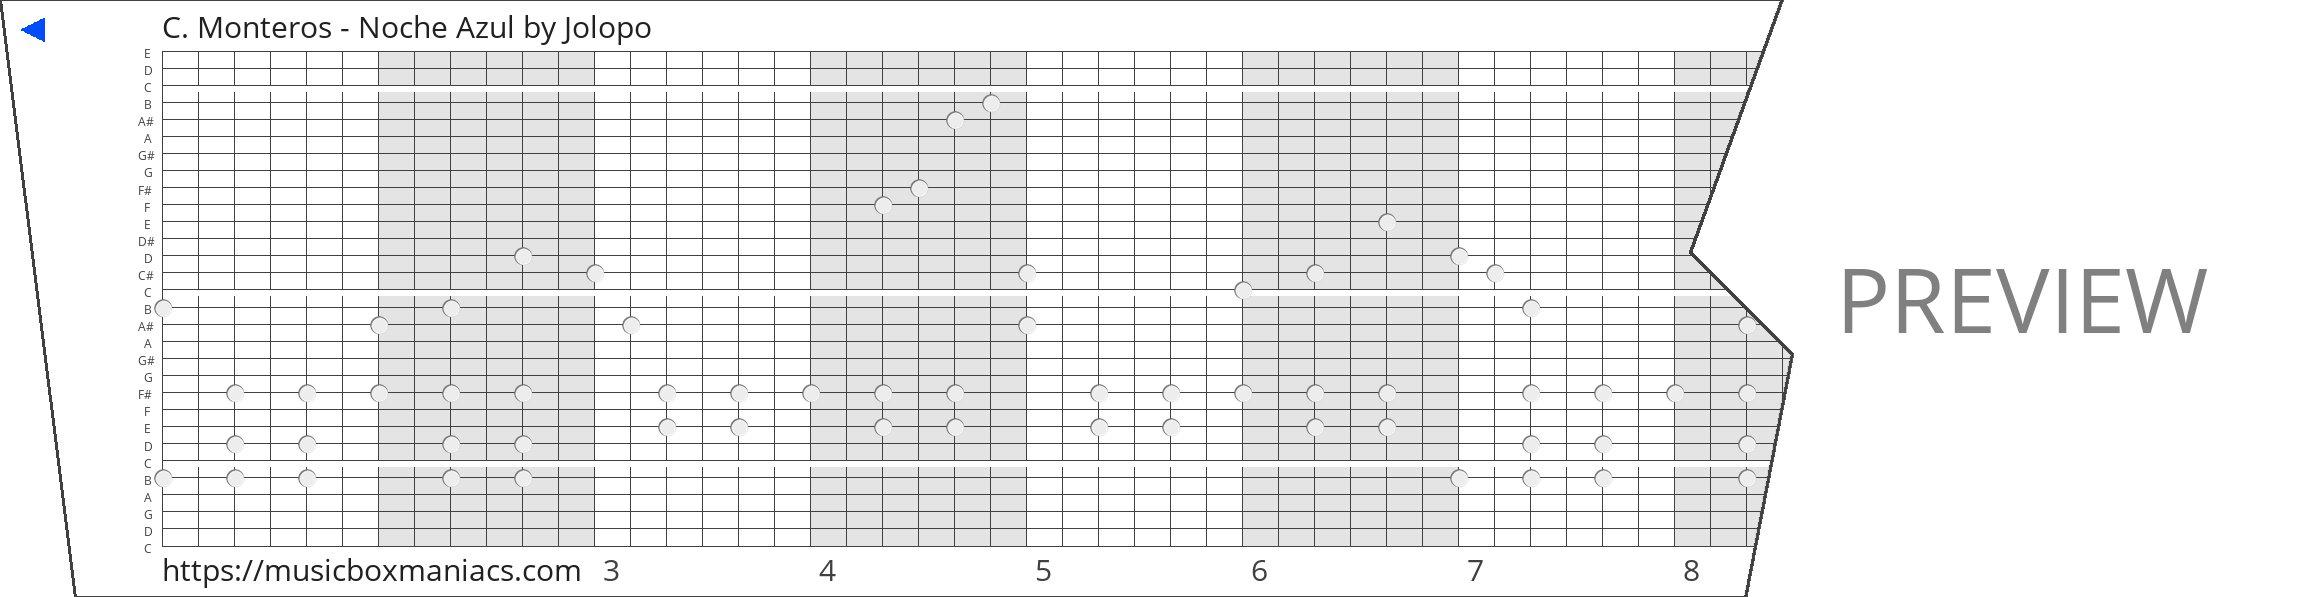 C. Monteros - Noche Azul 30 note music box paper strip